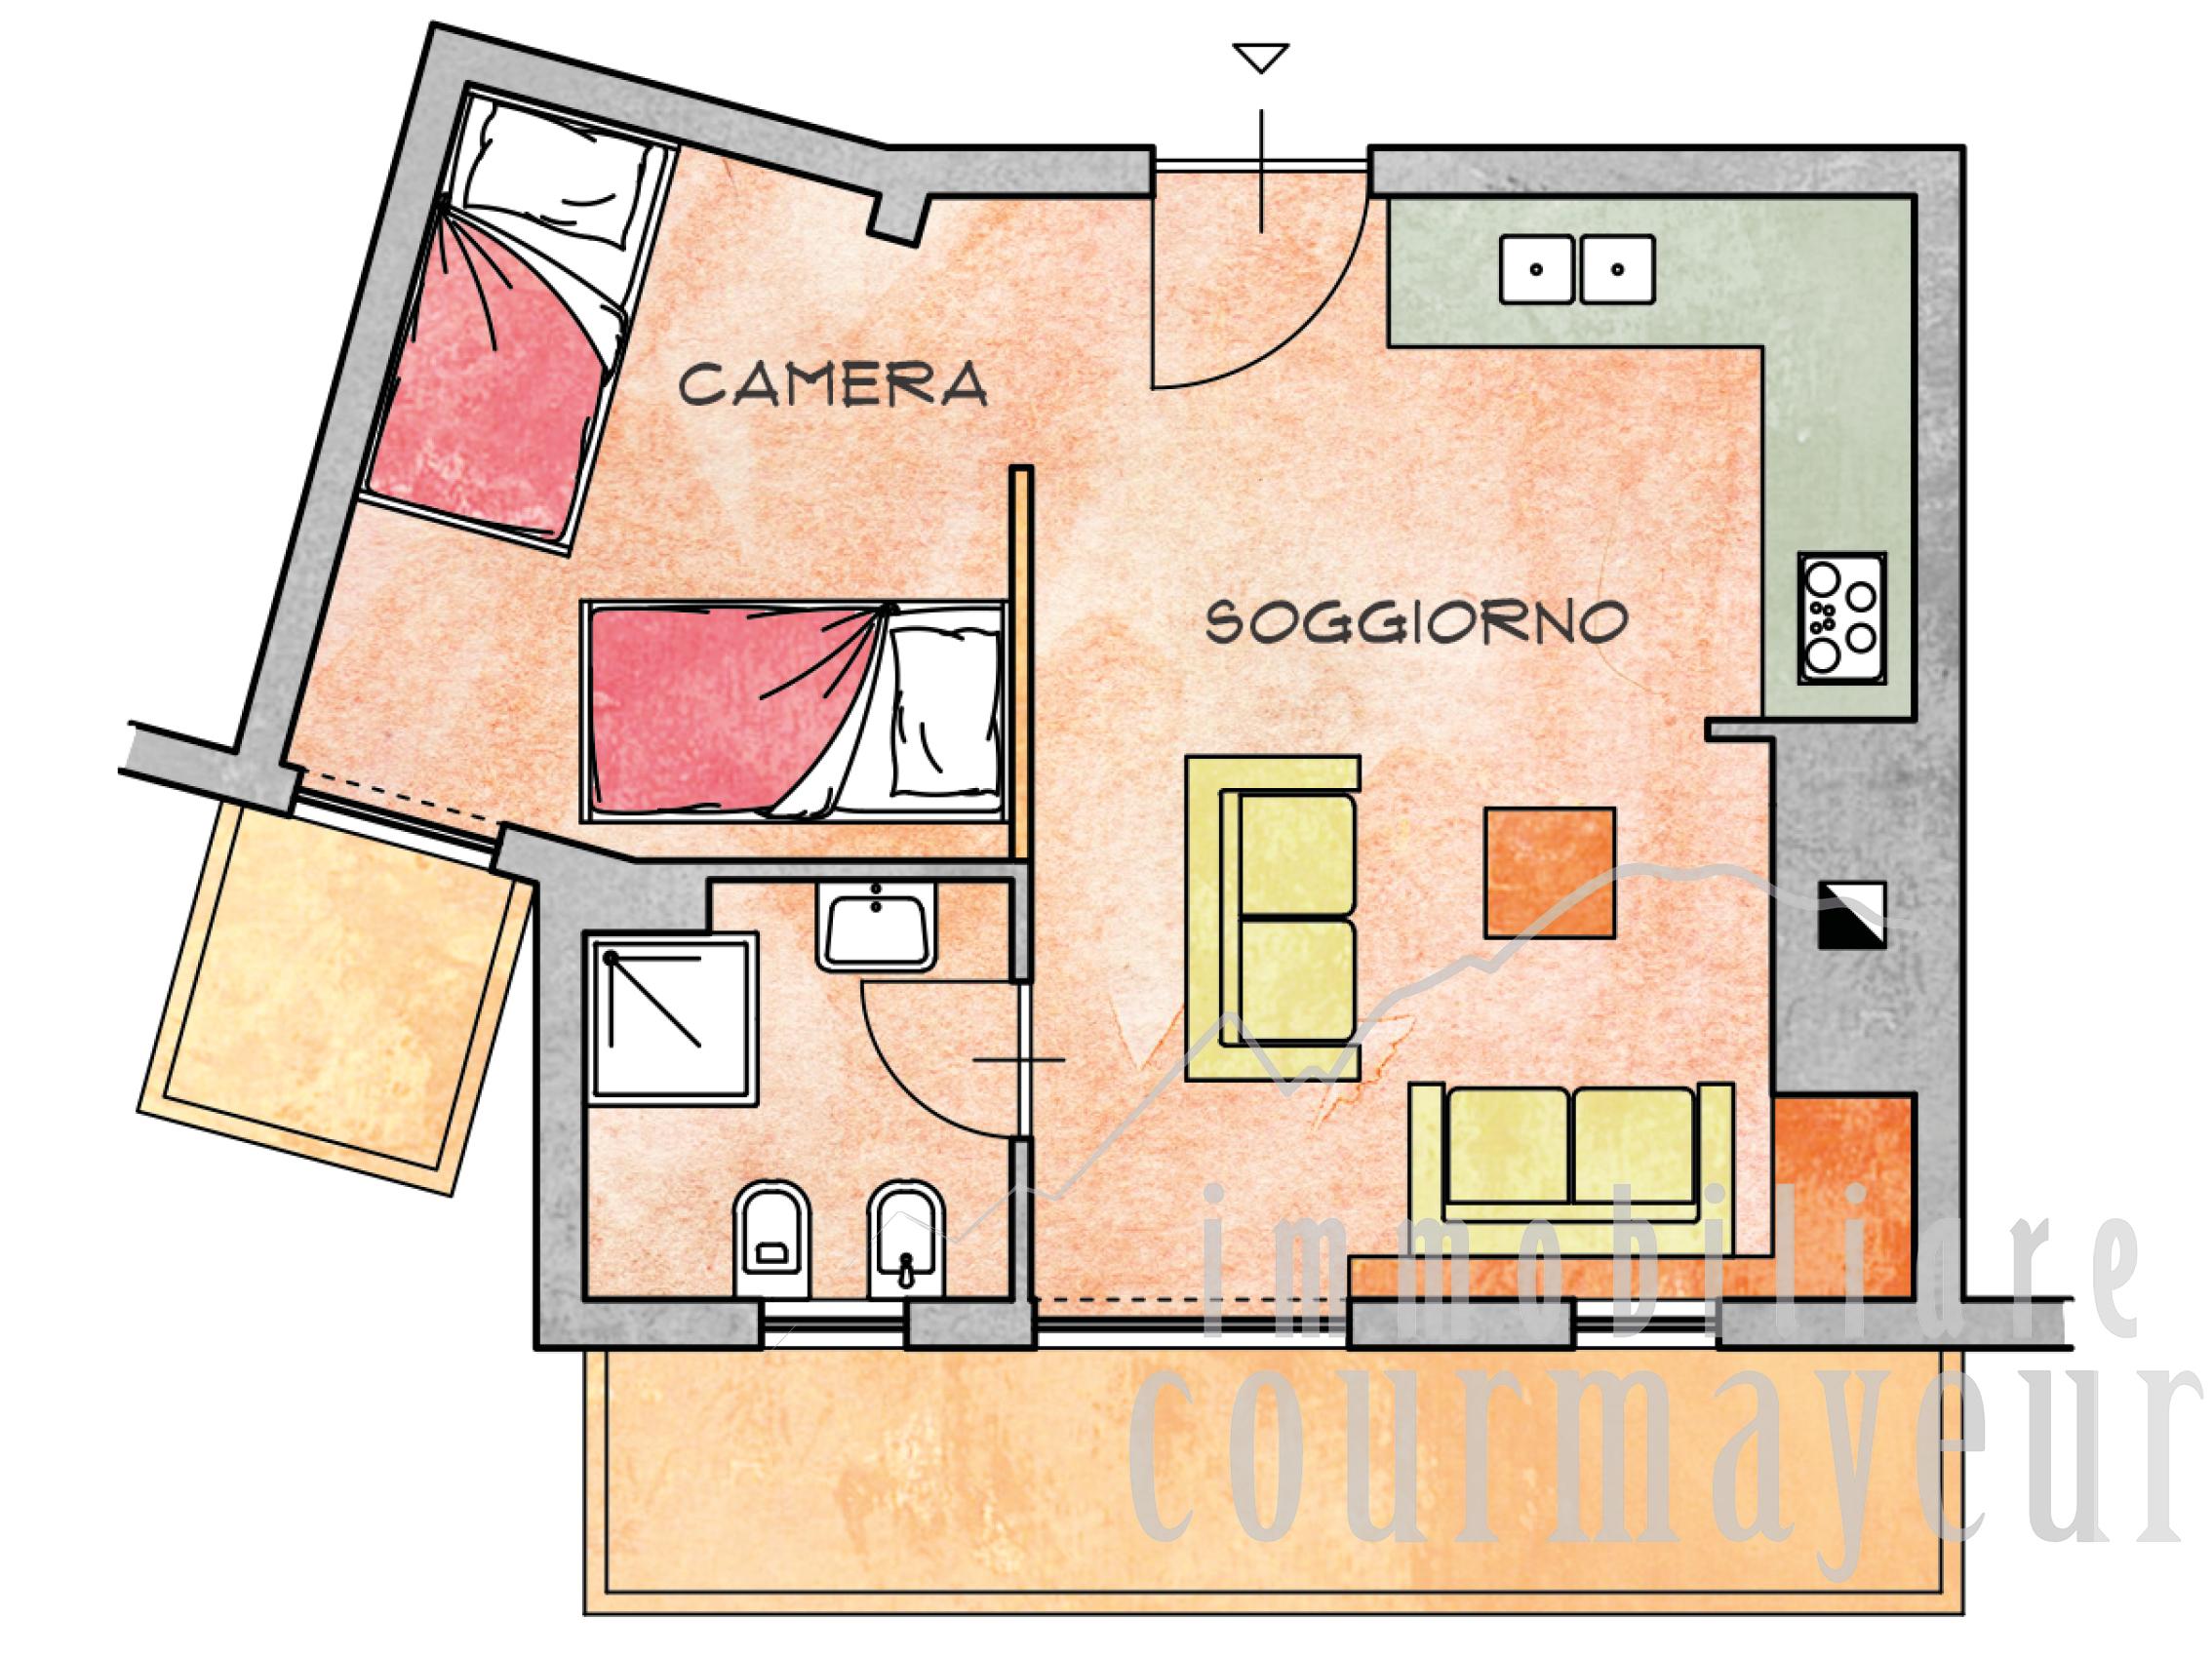 courmayeur plan gorret monolocale 40 mq planimetria - immobiliare